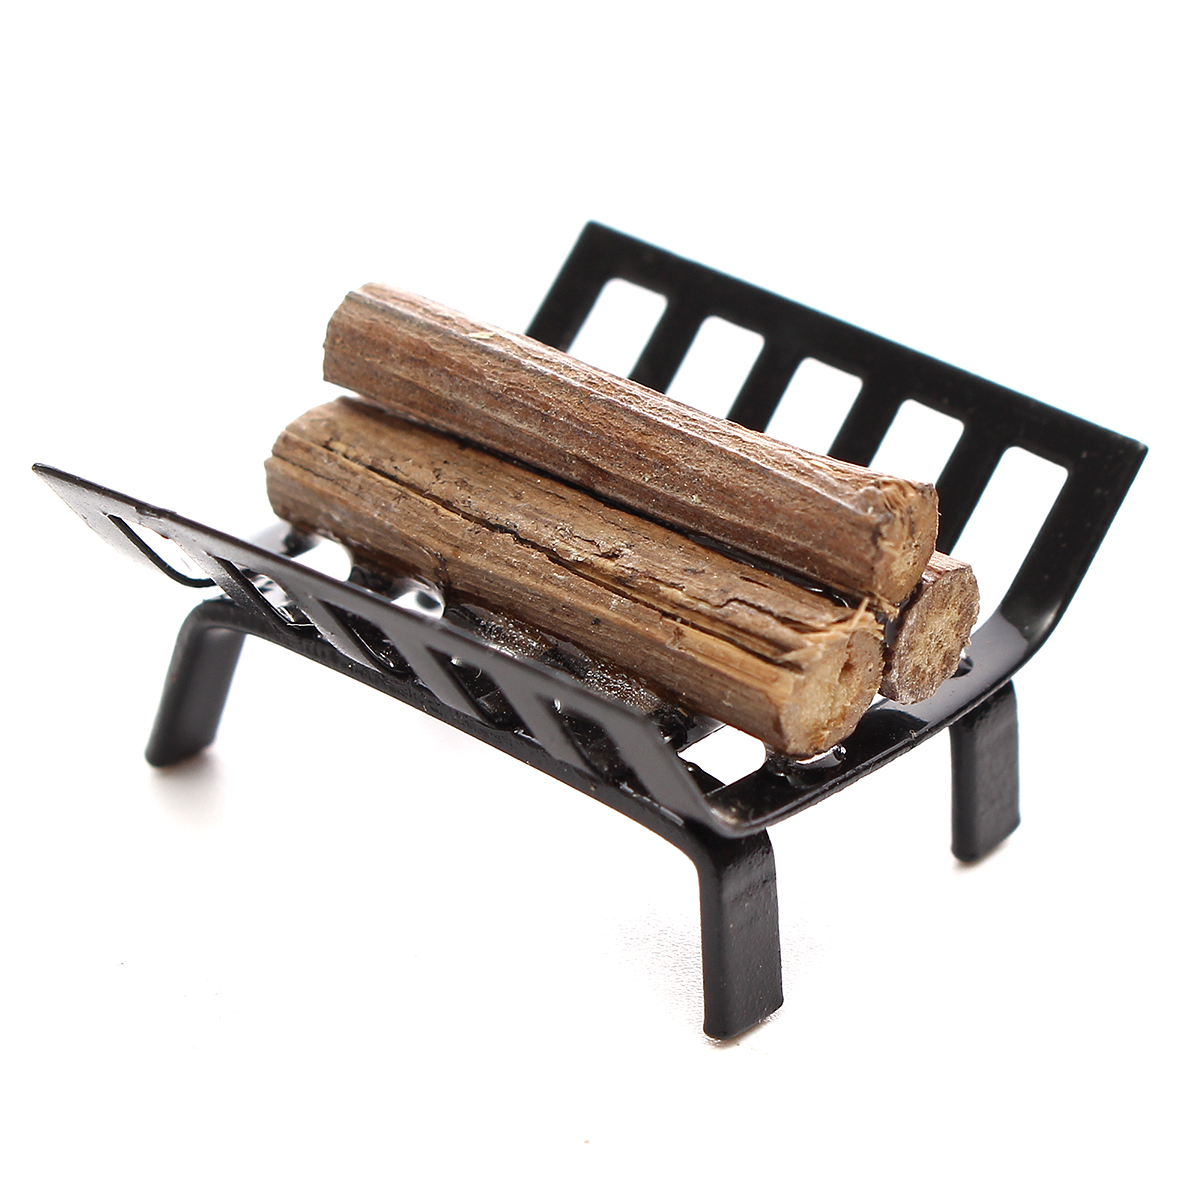 new firewood dollhouse miniature kitchen furniture wooden new design fashion kitchen furniture accessories